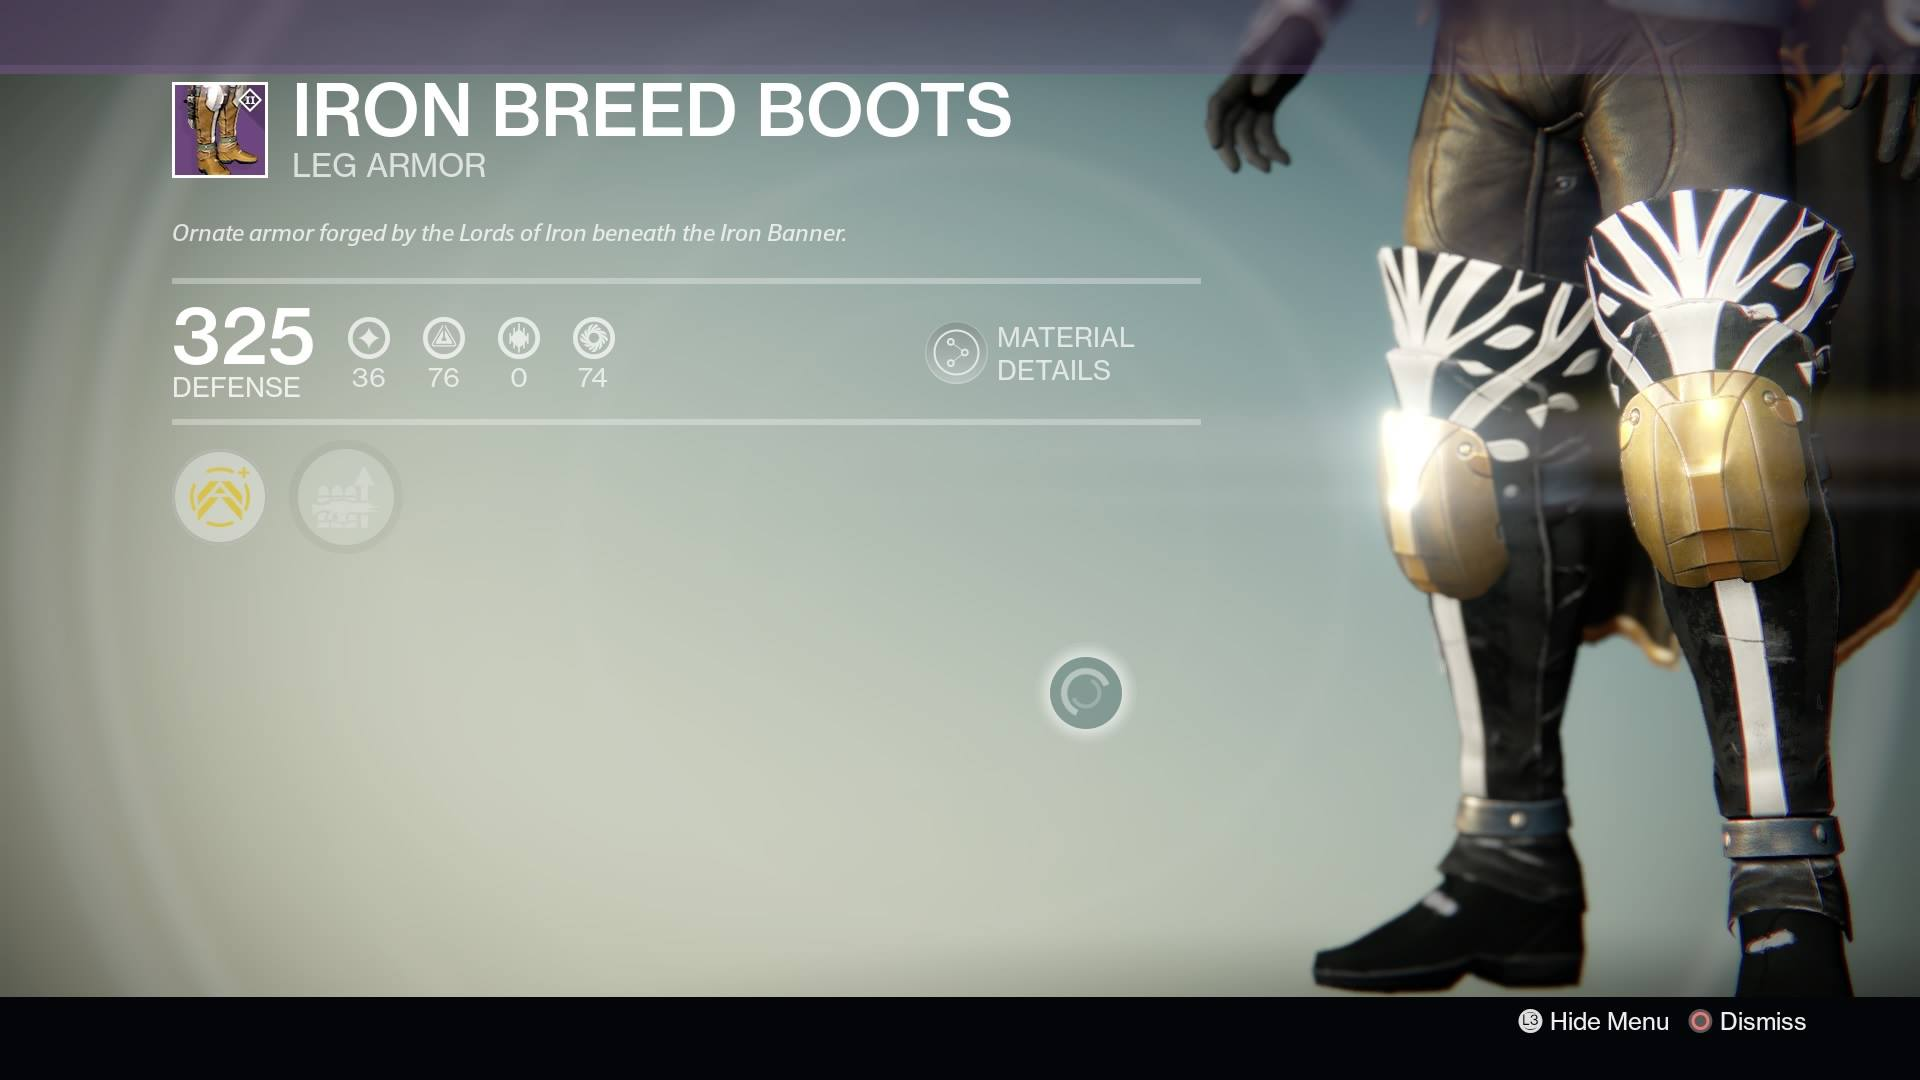 Destiny - Hunter Iron Breed Boots